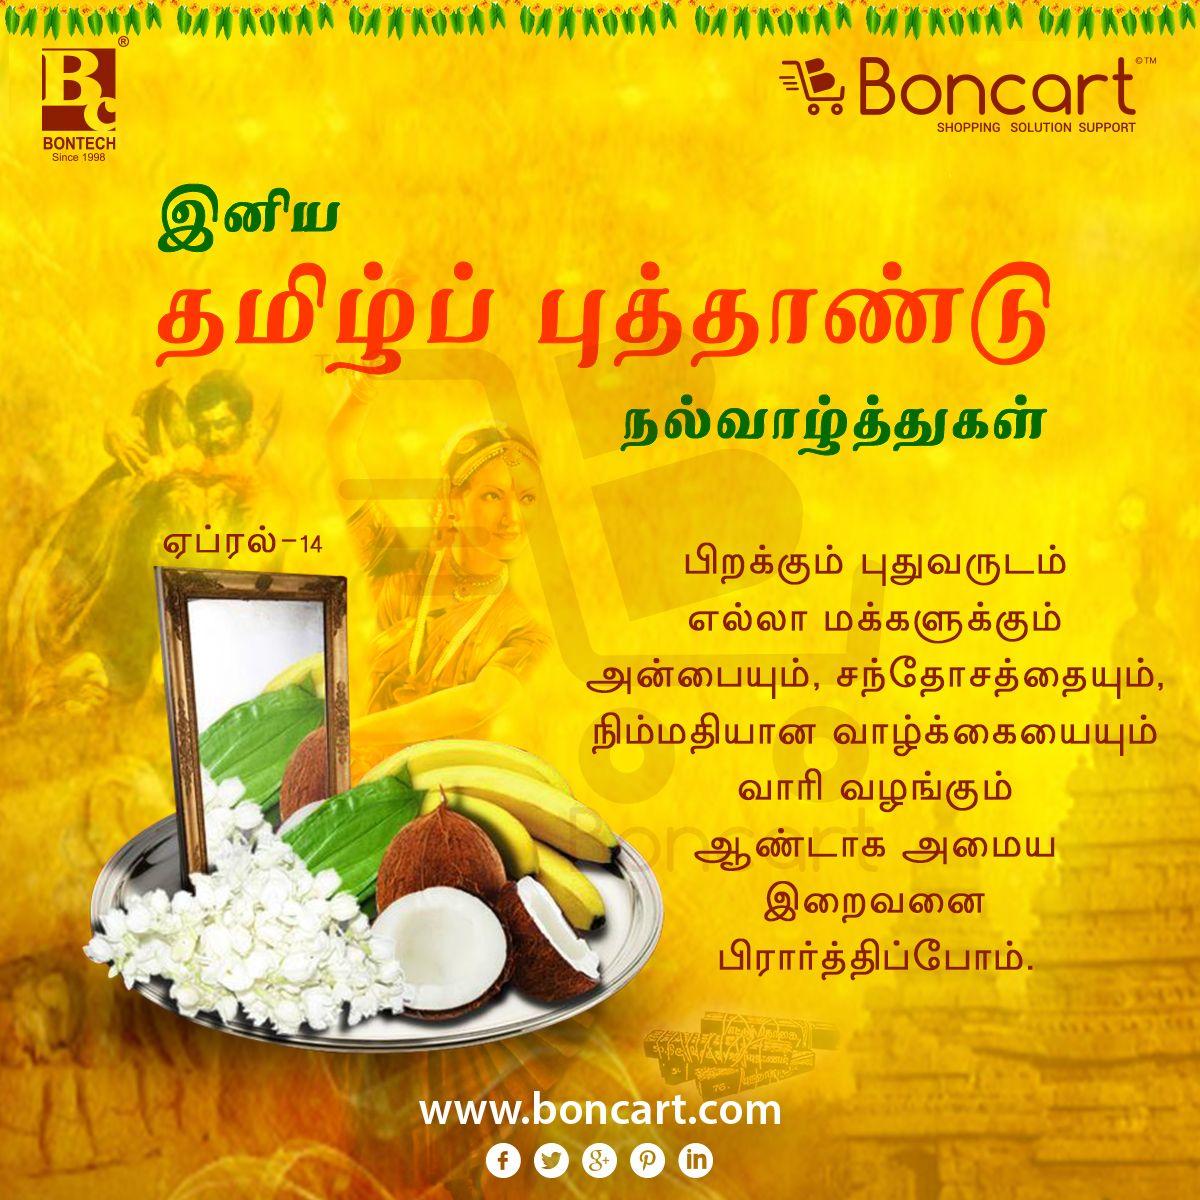 Happy Tamil Puththandu tamil New Year April 14 Newyear